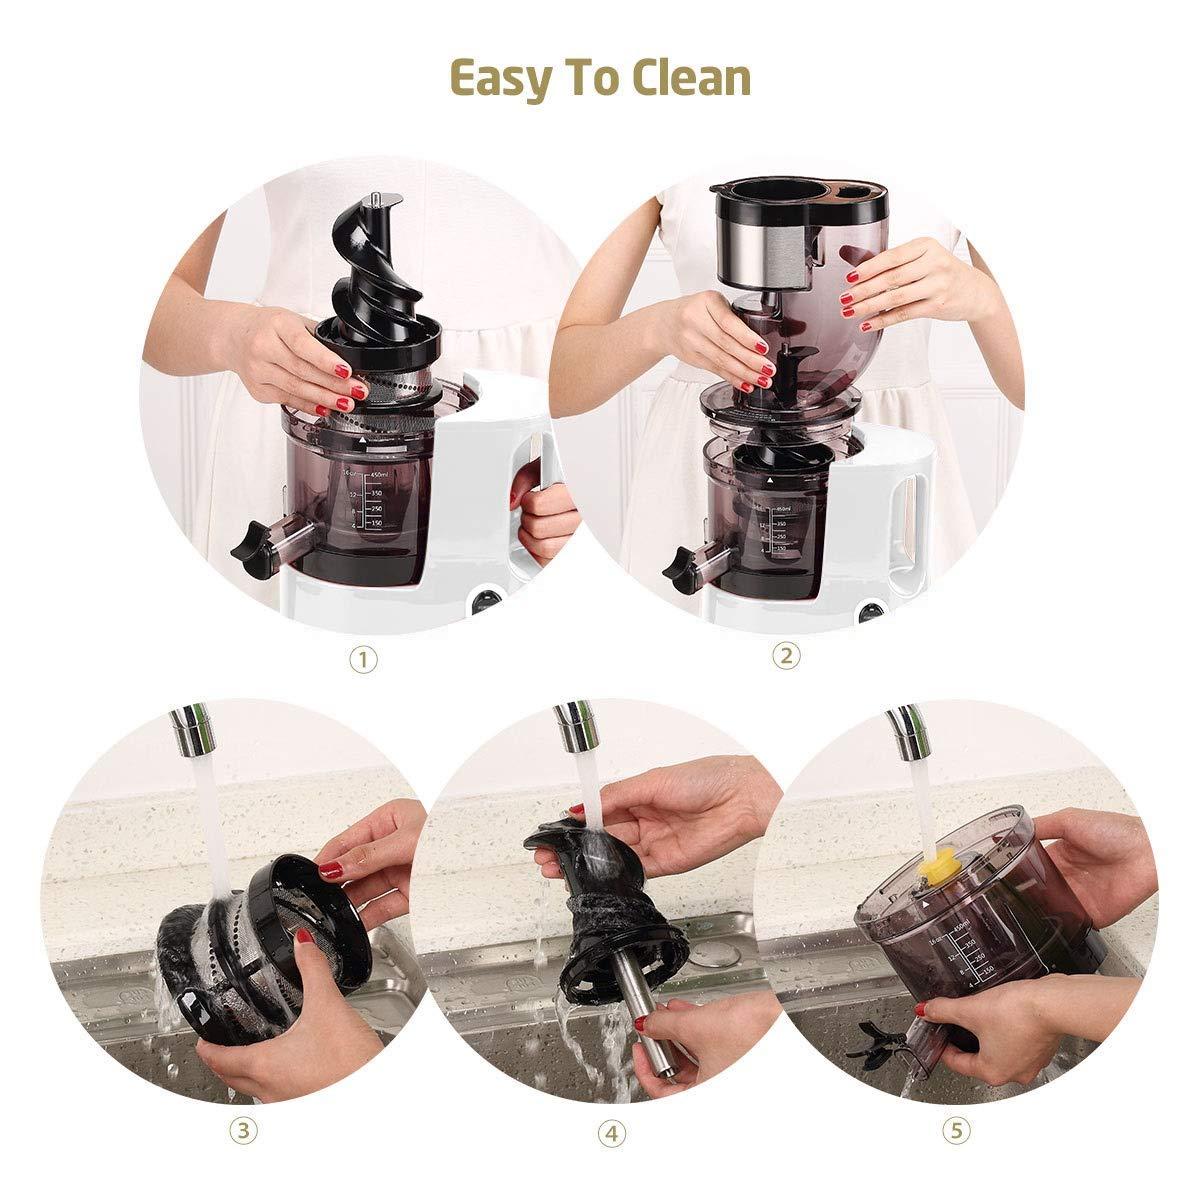 SKG Slow Masticating Juicer Wide Chute Cold Press Juicer Machine BPA Free (200W AC Motor, 45 RPM), White by SKG (Image #4)